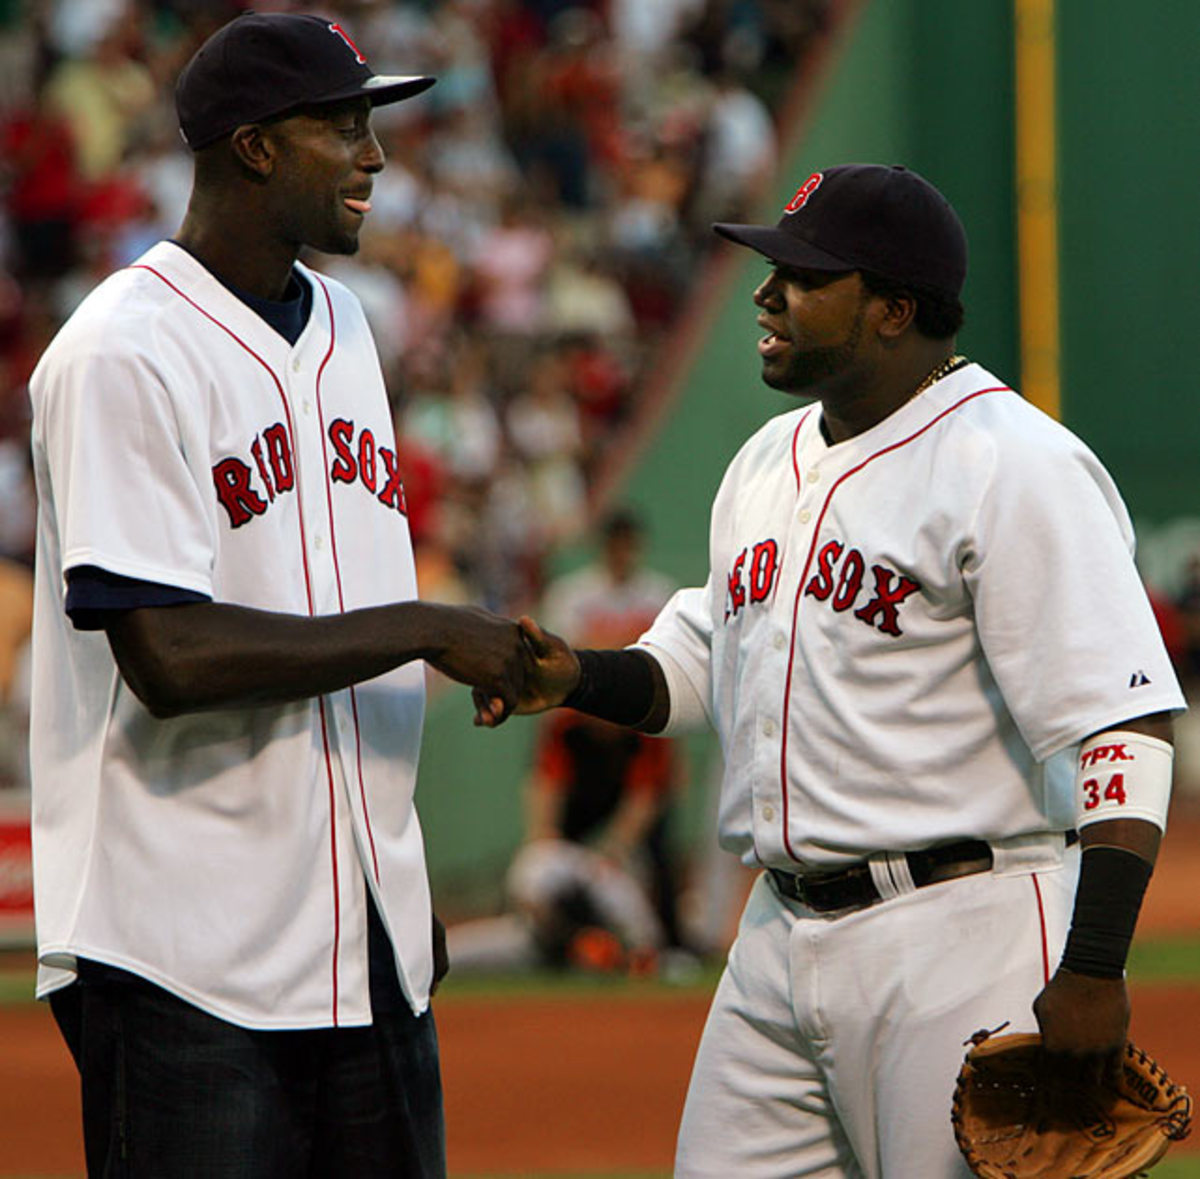 Kevin Garnett and David Ortiz